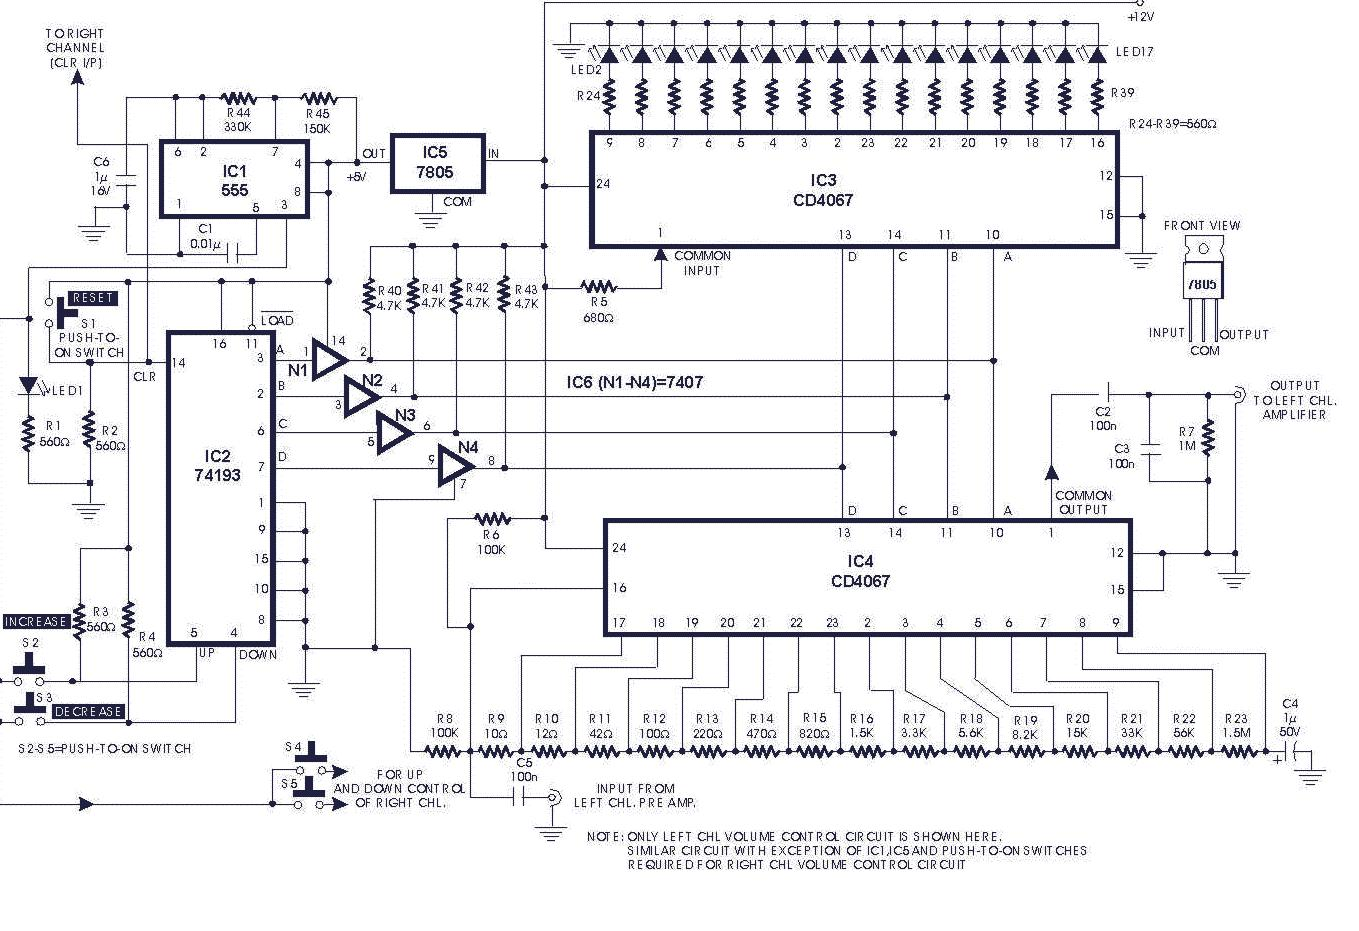 sanyo car stereo loudspeaker speaker systems service manual